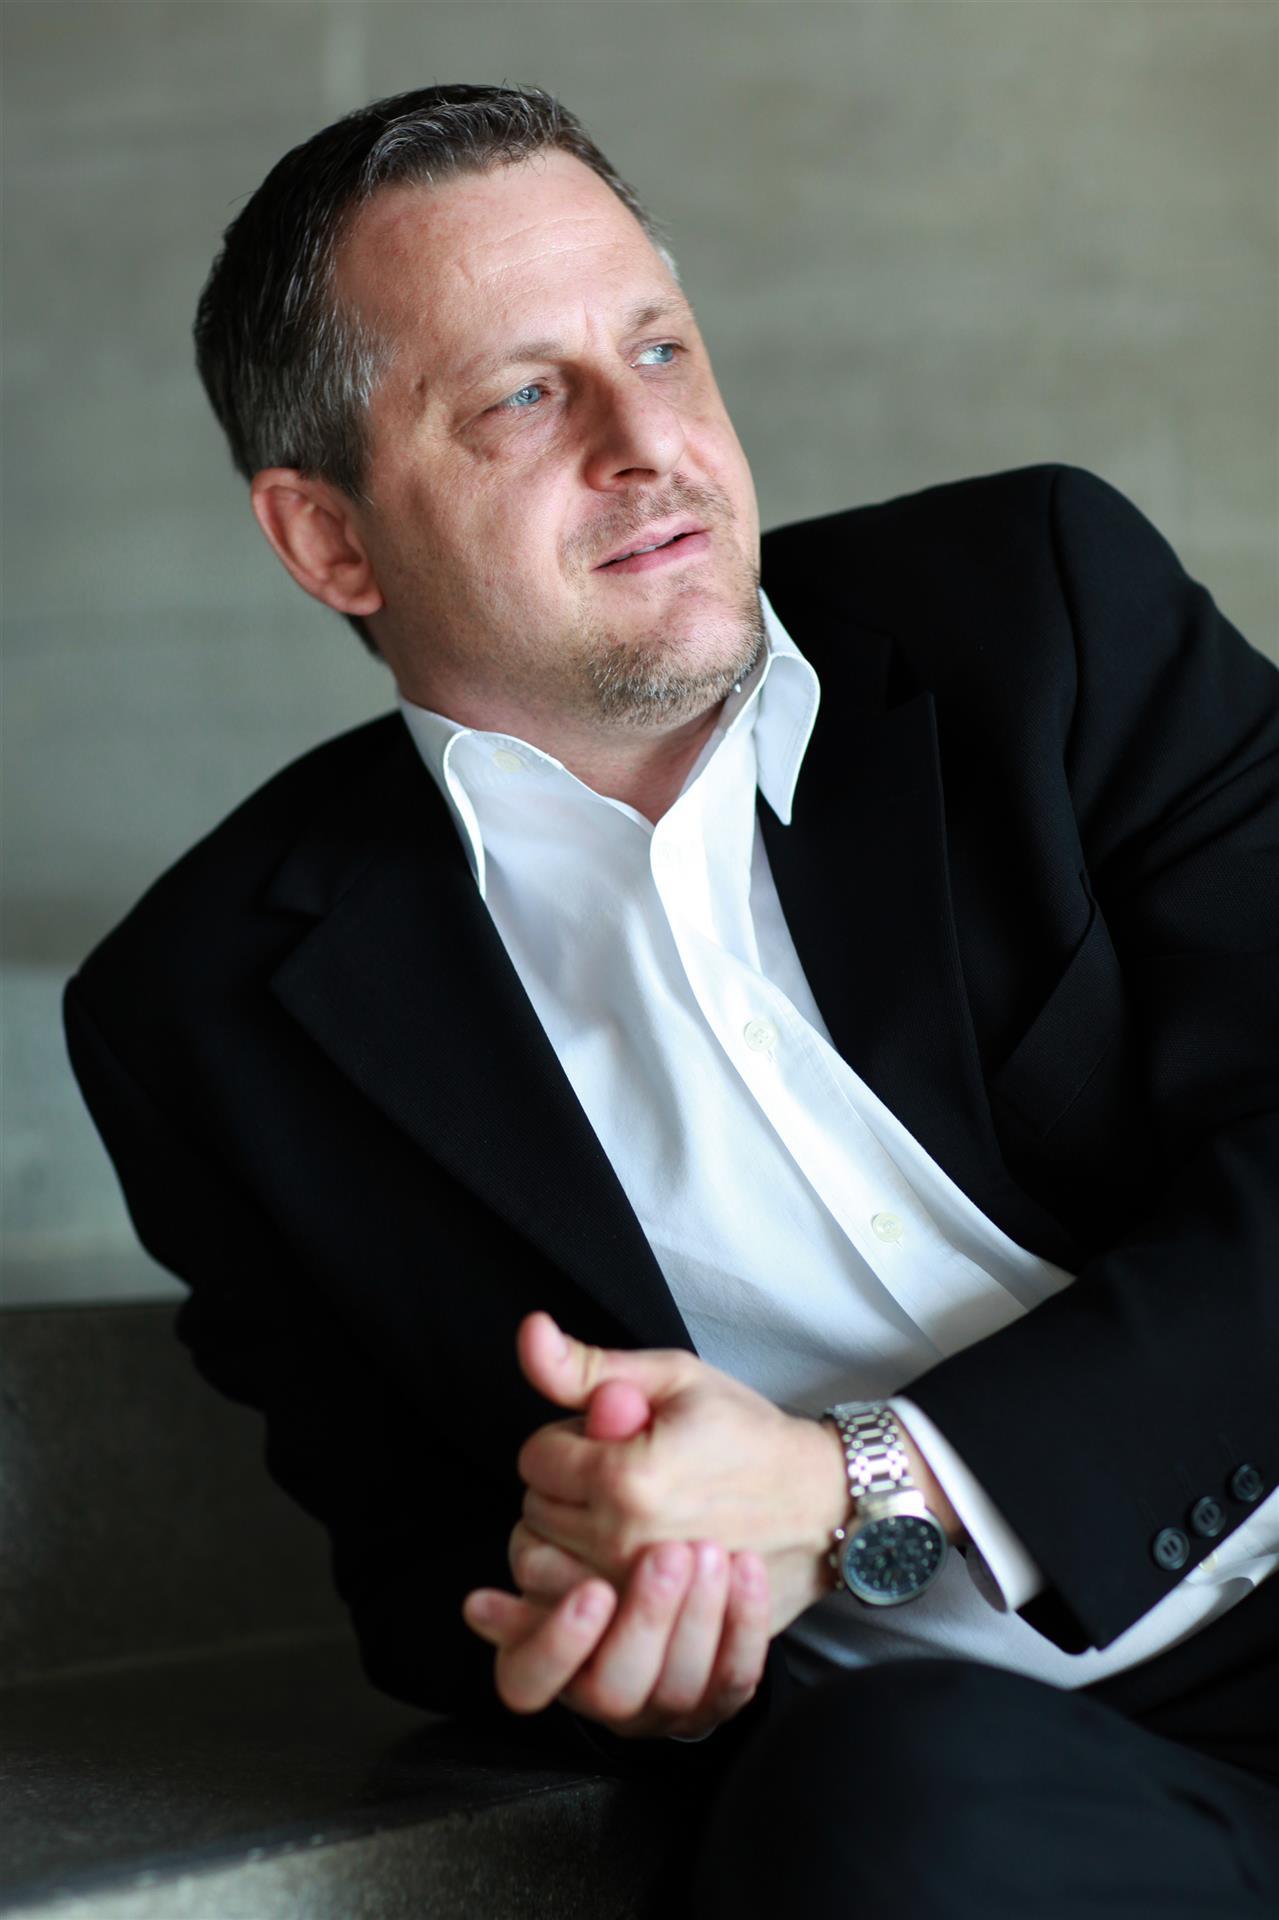 Michael Gniffke